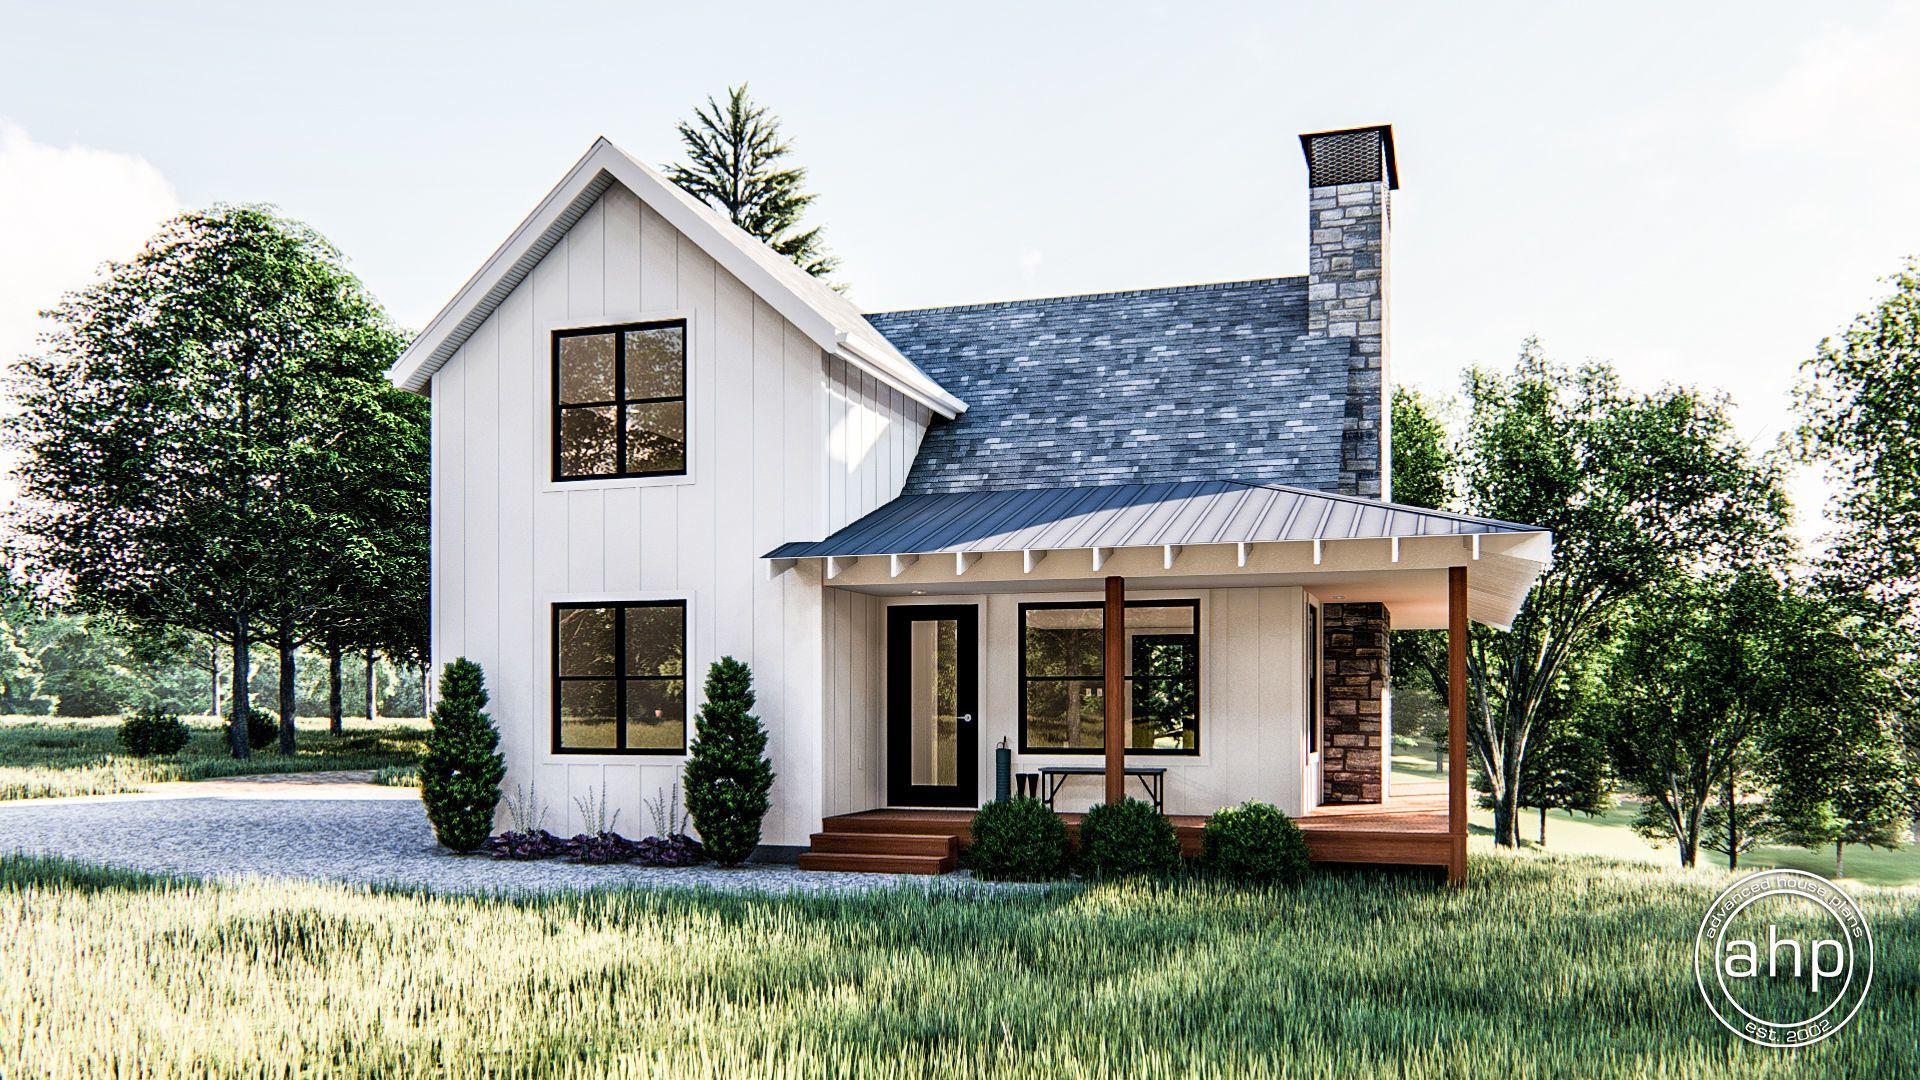 Modern Farmhouse Cabin Plan | Lilly | Small farmhouse plans ...